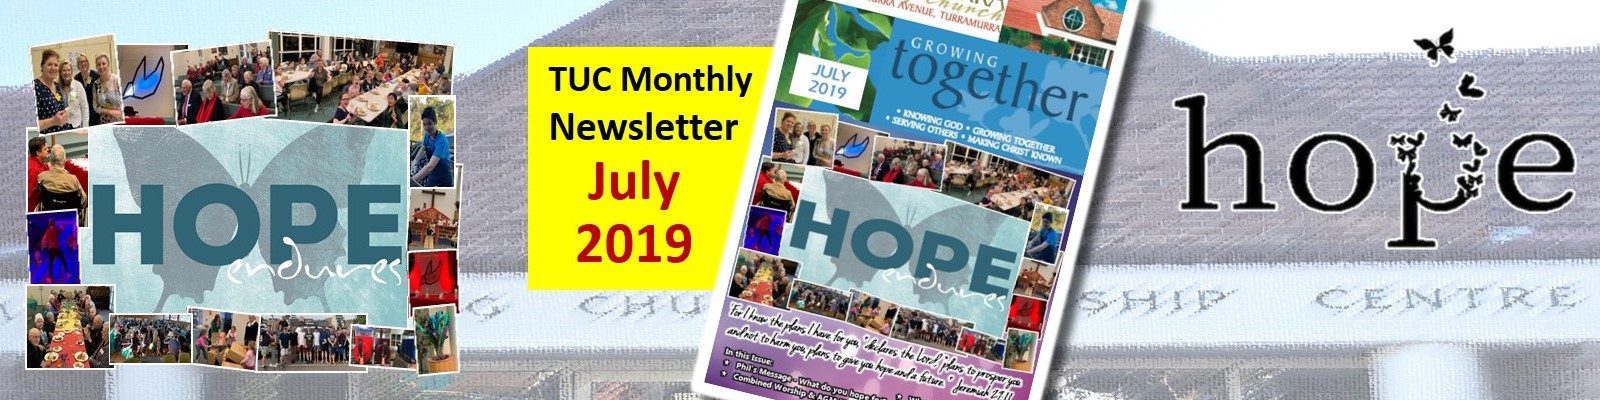 July 2019 Newsletter (Hope)